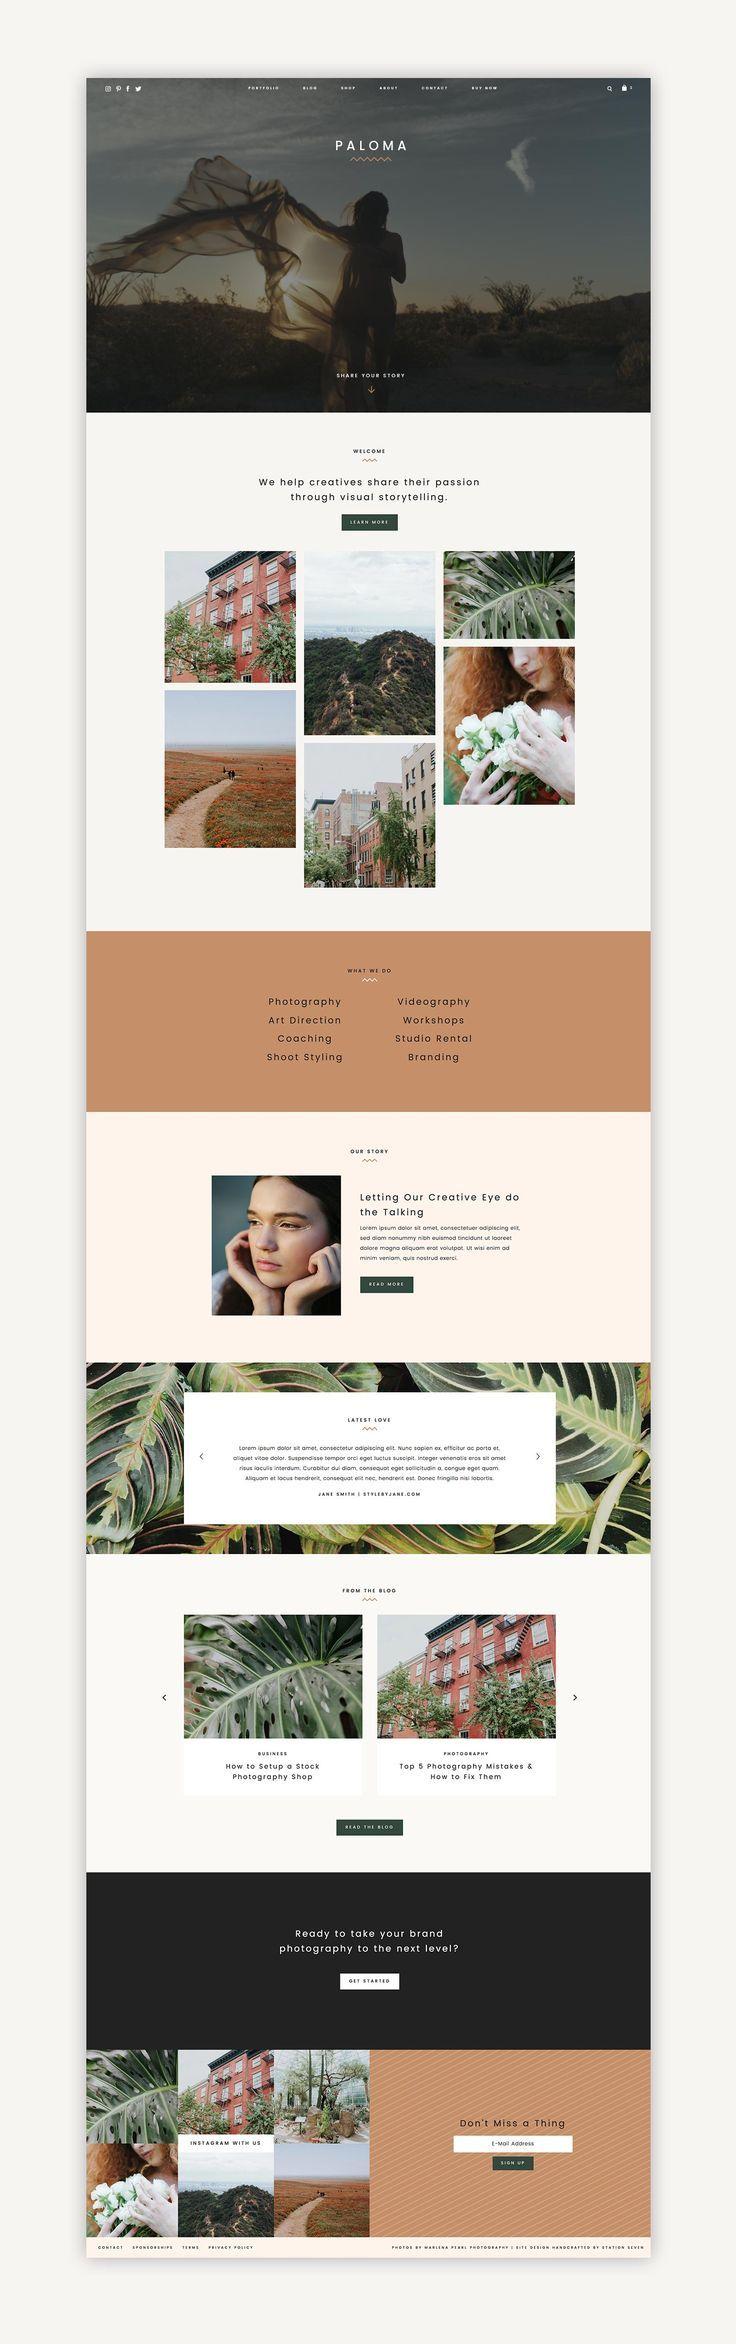 Paloma WordPress Theme - Station Seven WordPress Themes